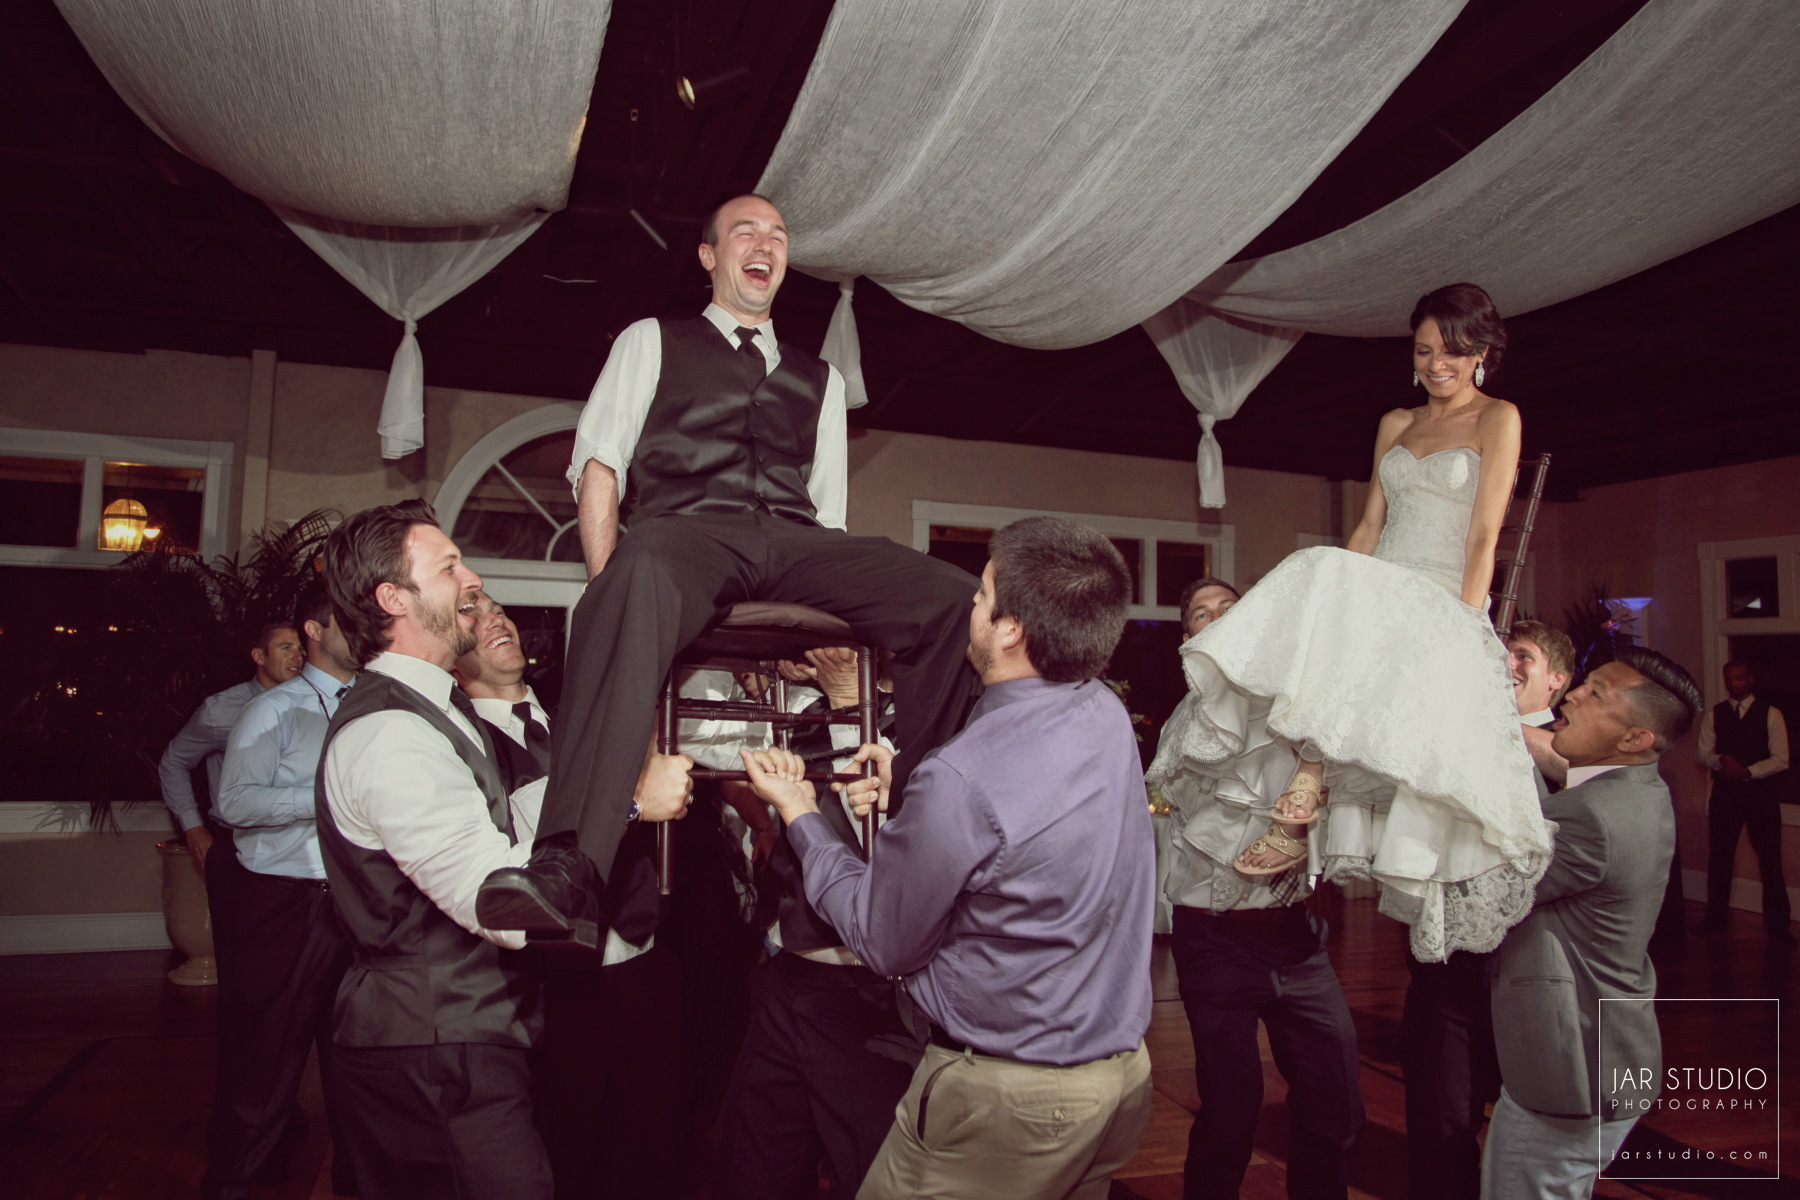 28-horah-dance-the-grand-ballroom-st.augustine-jarstudio-jewish-wedding-photographer.JPG